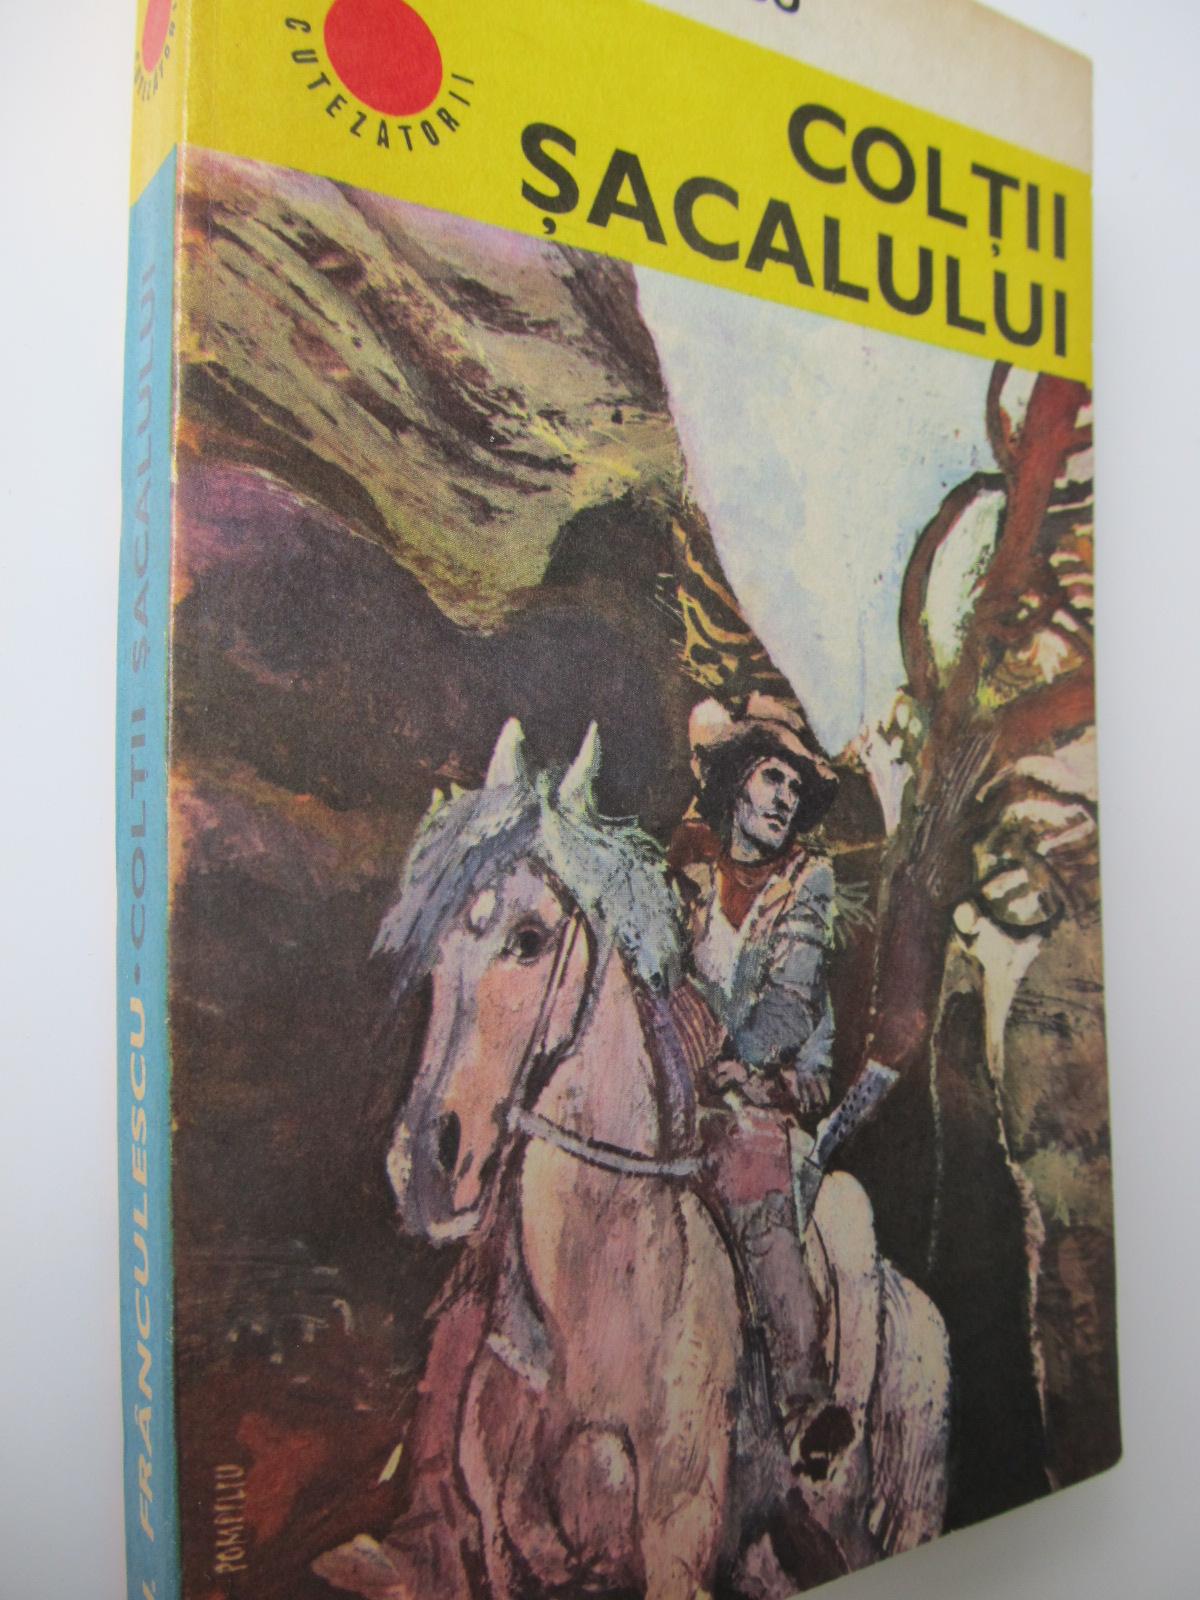 Coltii sacalului - N. Franculescu | Detalii carte